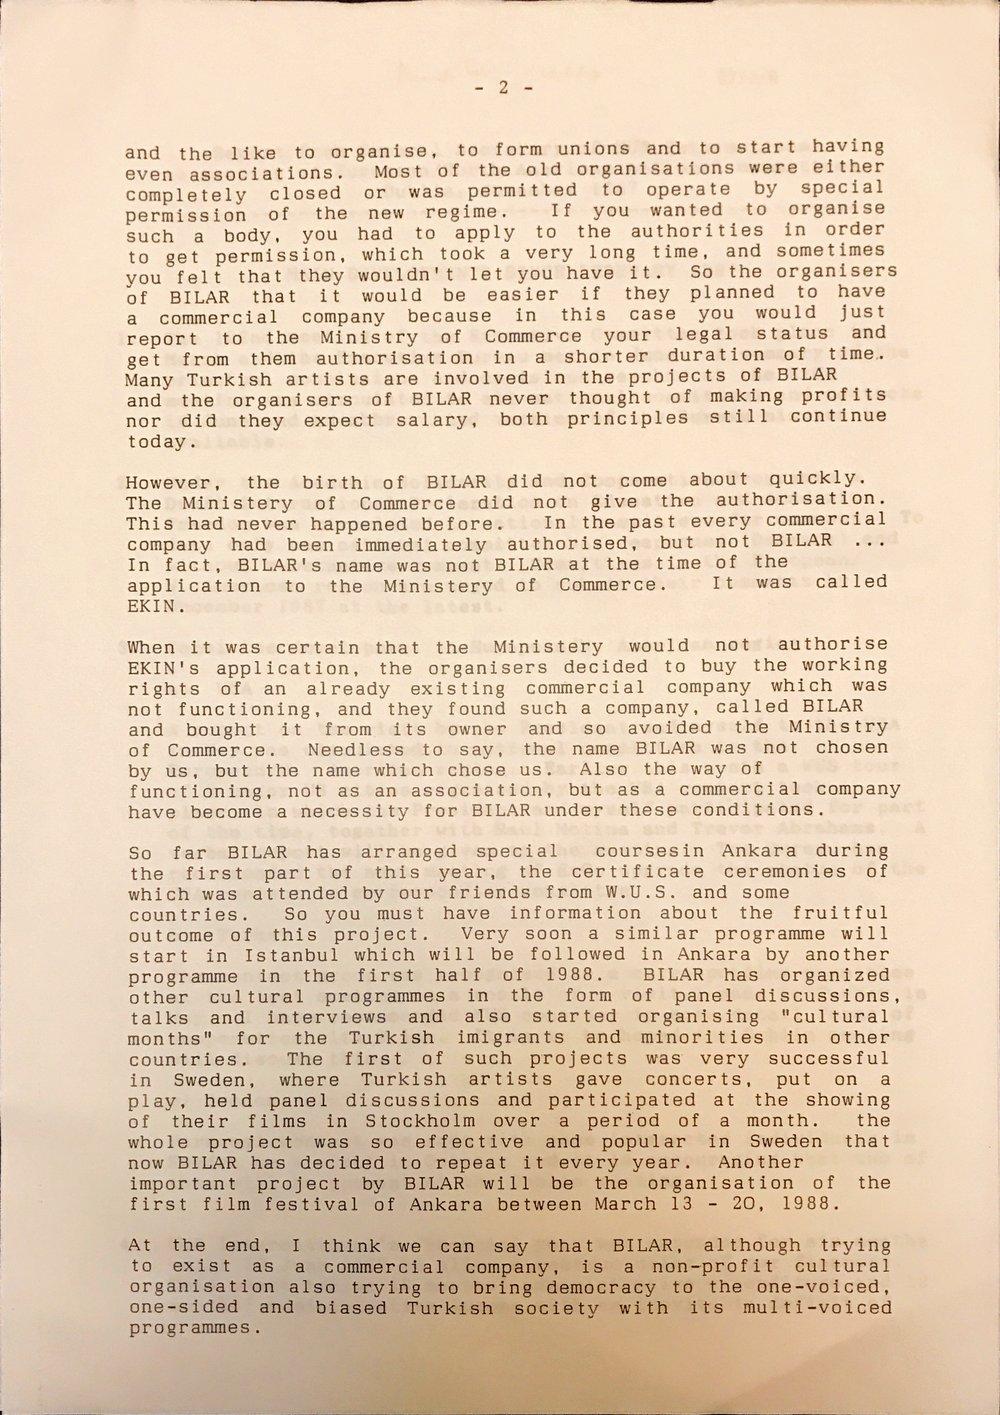 1987_report-wus-dublin_annex-by-mahmut-tali-ongoren-2.JPG